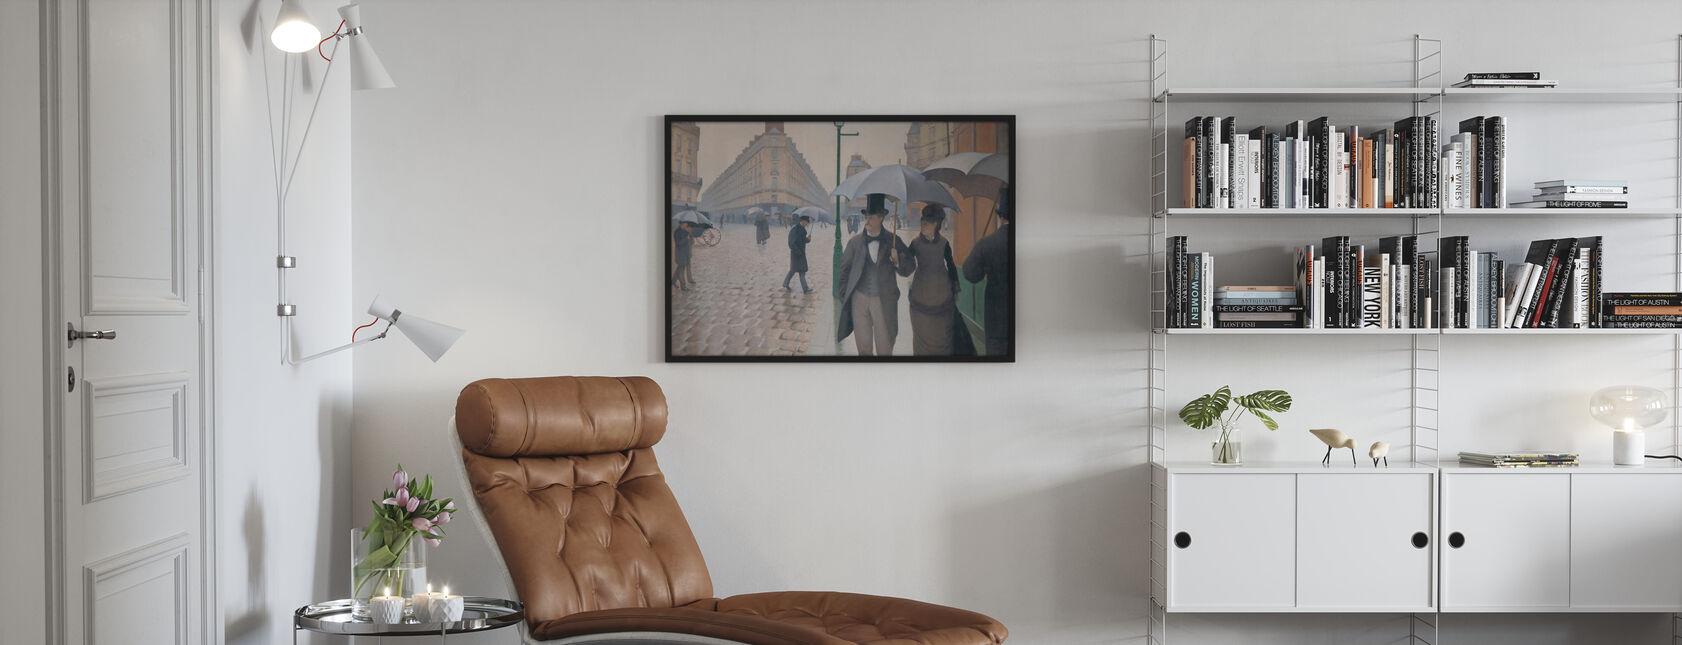 Via Parigi - Gustave Caillebotte - Poster - Salotto